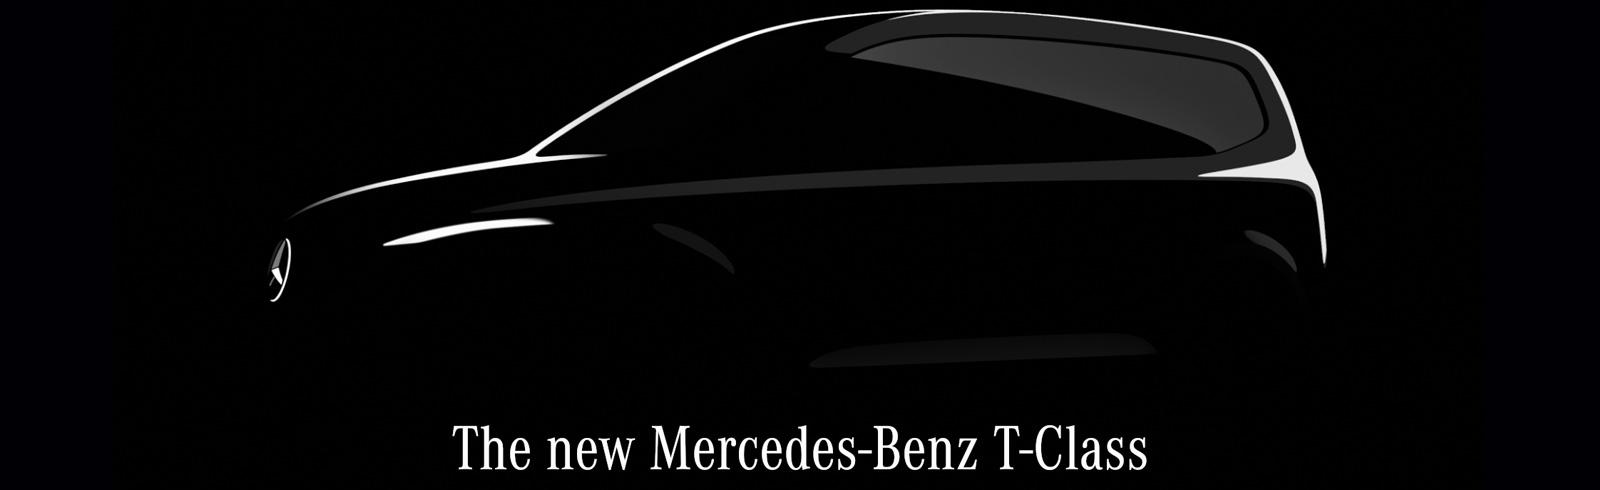 Mercedes-Benz T-Class - a new EV on a small van platform by Mercedes-Benz Vans